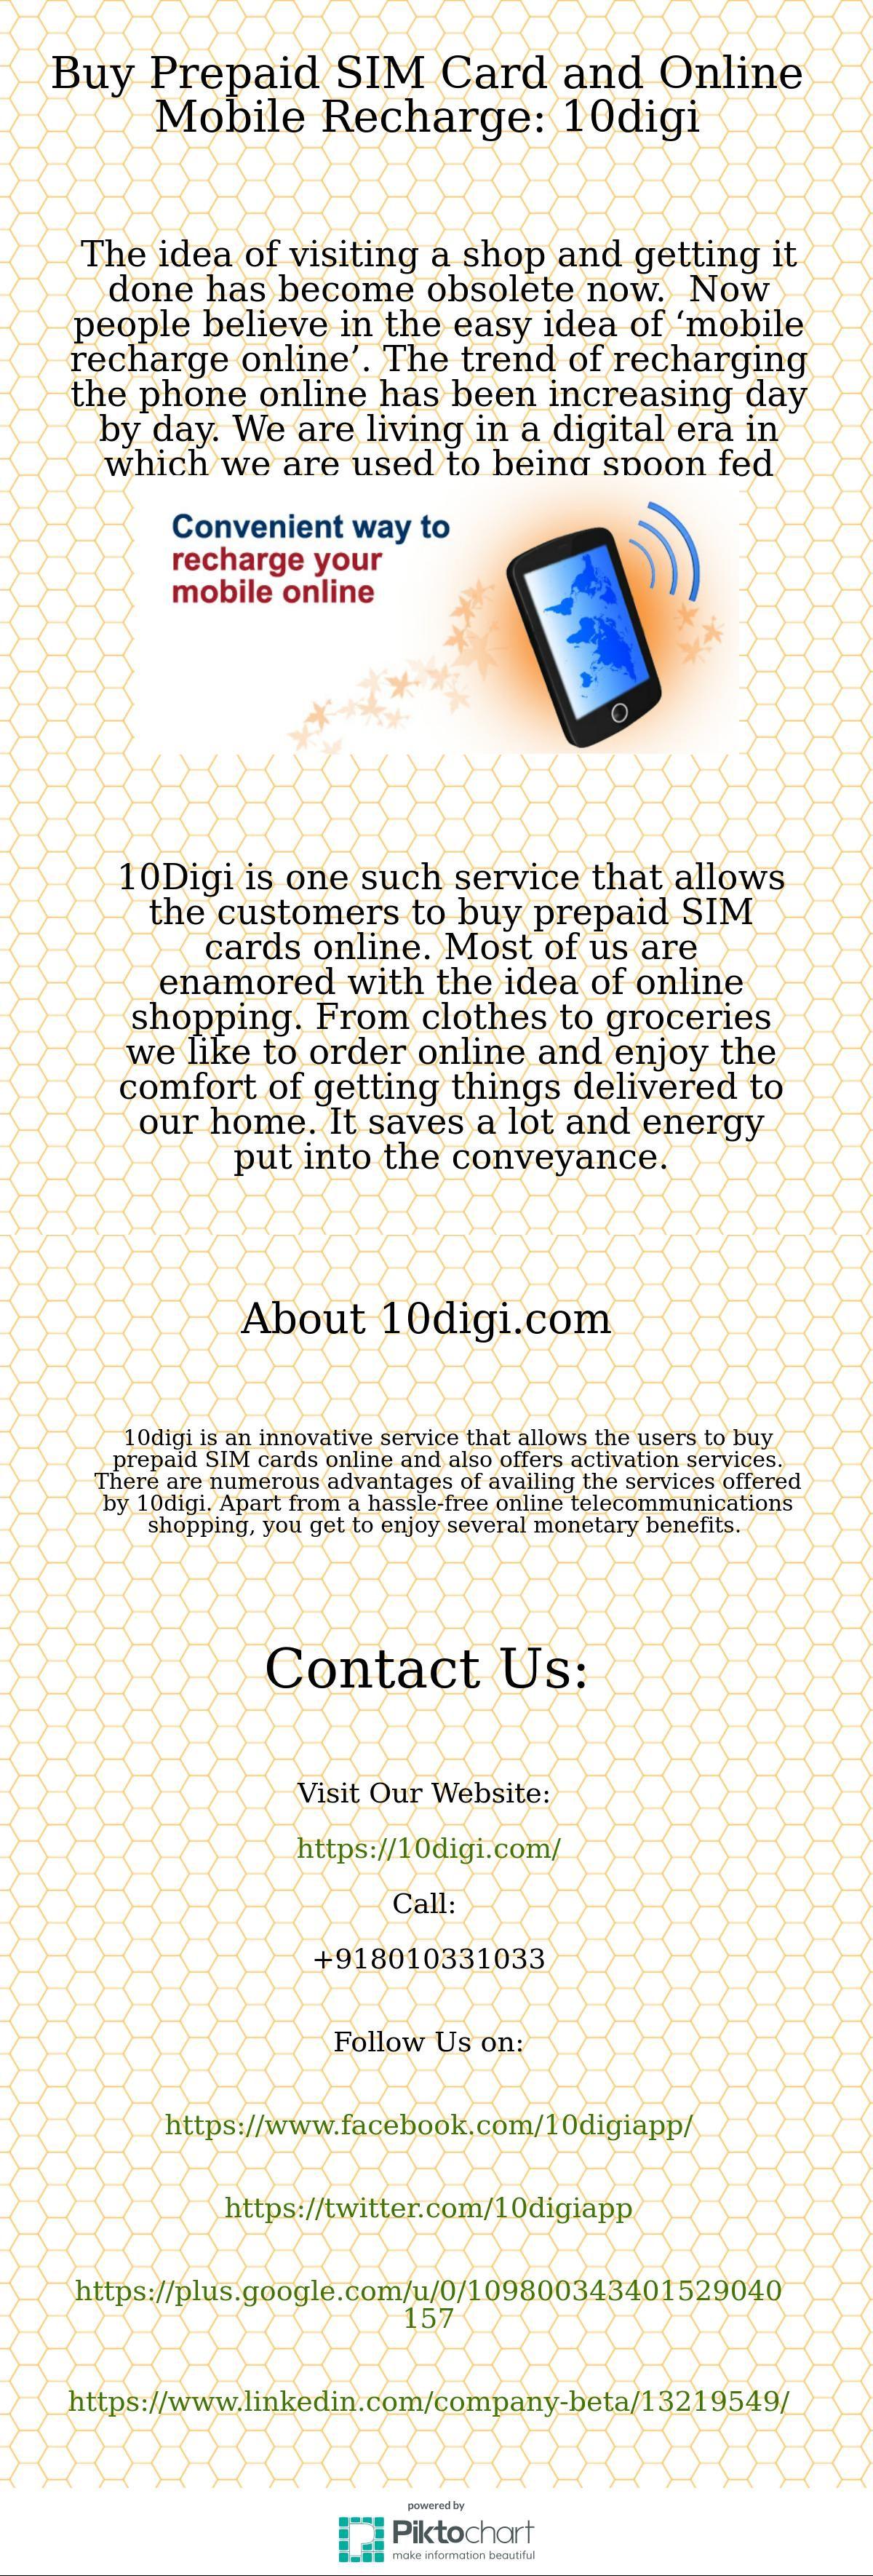 Buy prepaid sim card and online mobile recharge 10digi